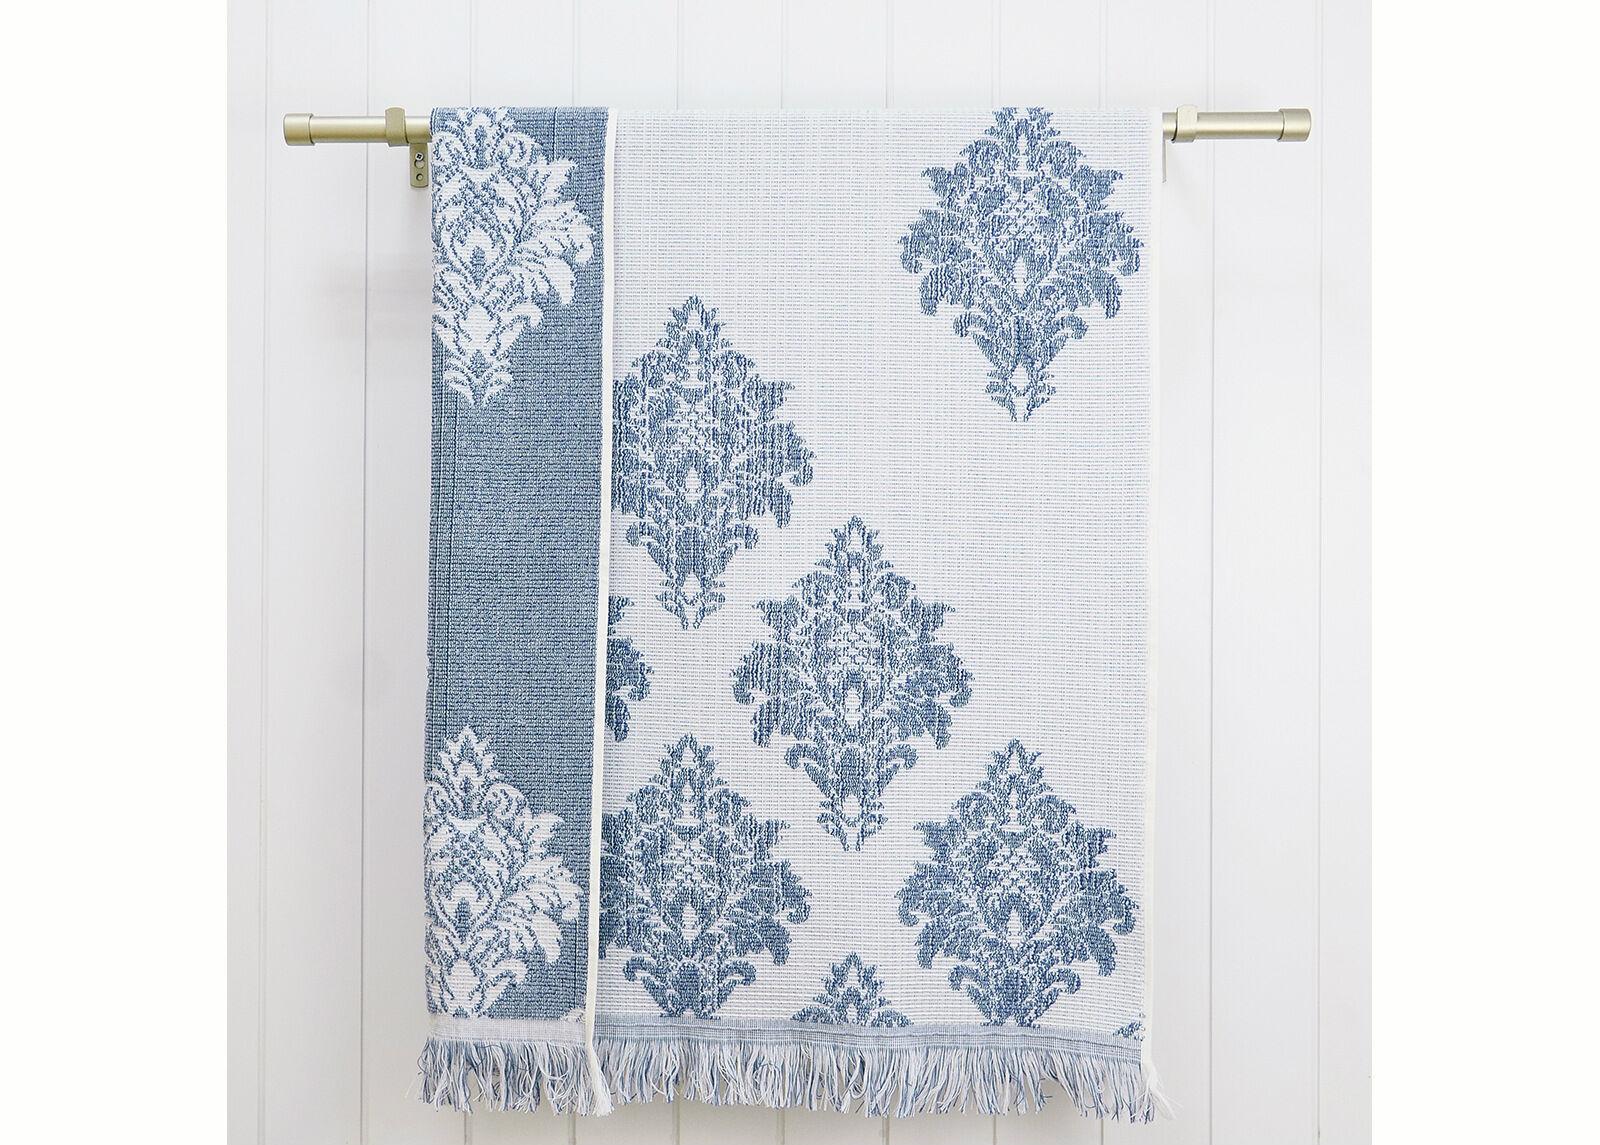 ARDENZA Froteepyyhe Versailles, sininen 70x140 cm